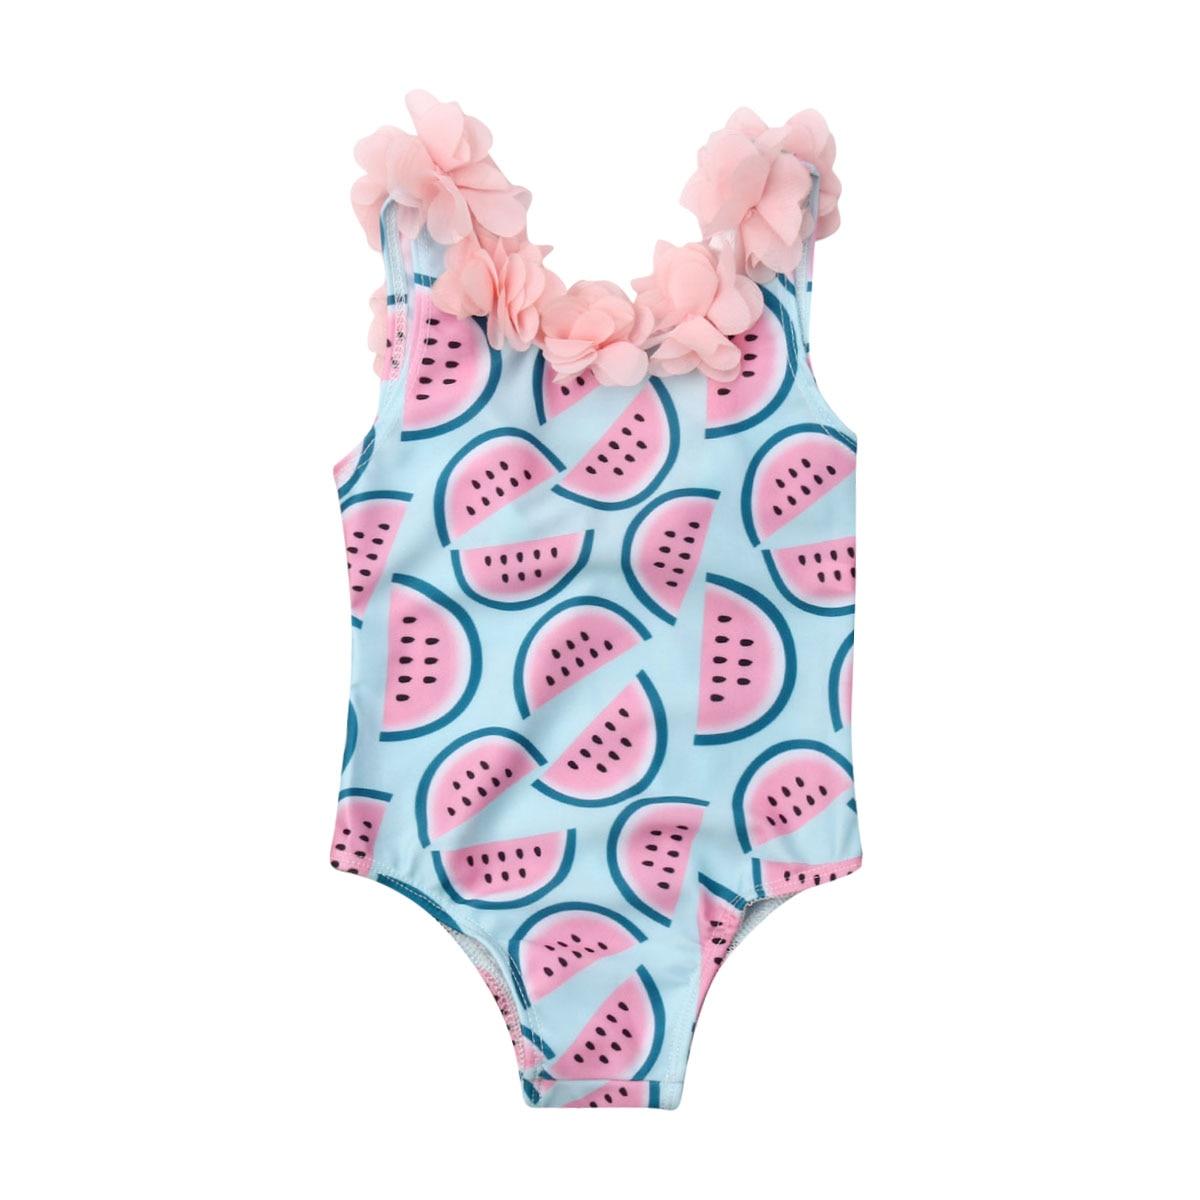 Pudcoco Toddler Infant Baby Girls Watermelon Swimsuit Swimwear Swimming Bikini One-Piece Bodysuit Swimwears For 0-4Years Girl